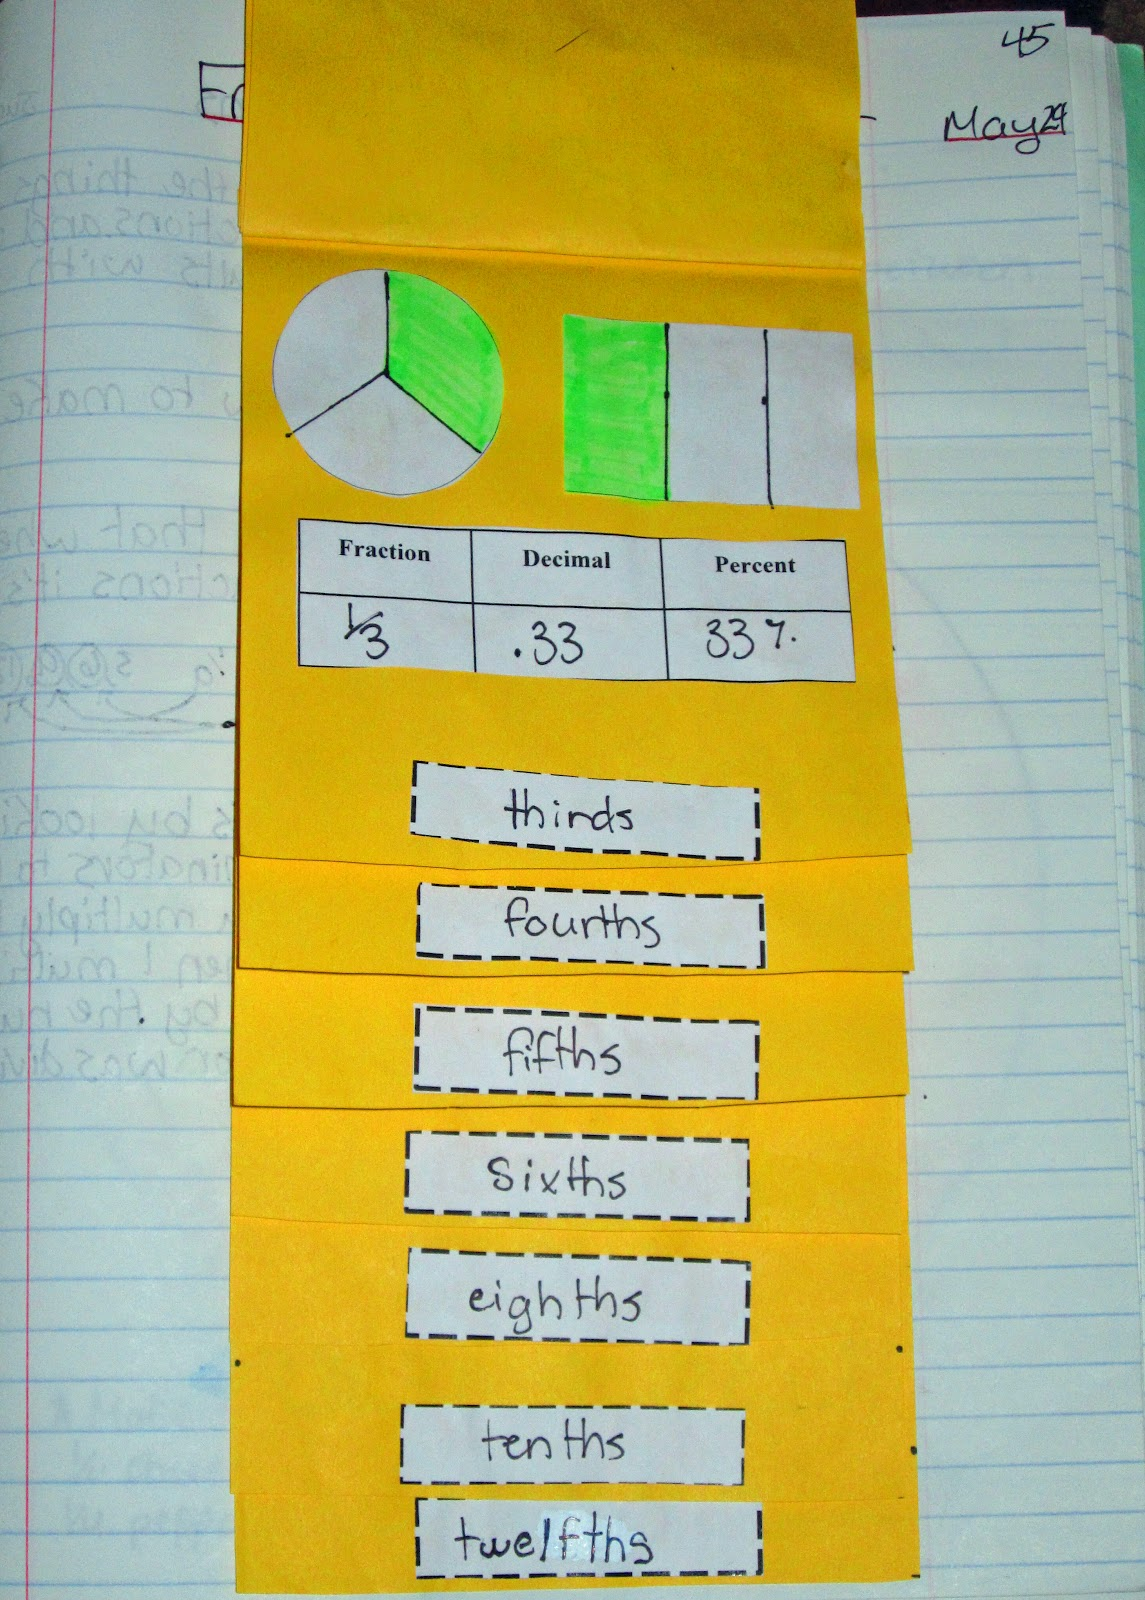 Rundes room math journal sundays fractions photo of fraction math journal entry rundes room maxwellsz